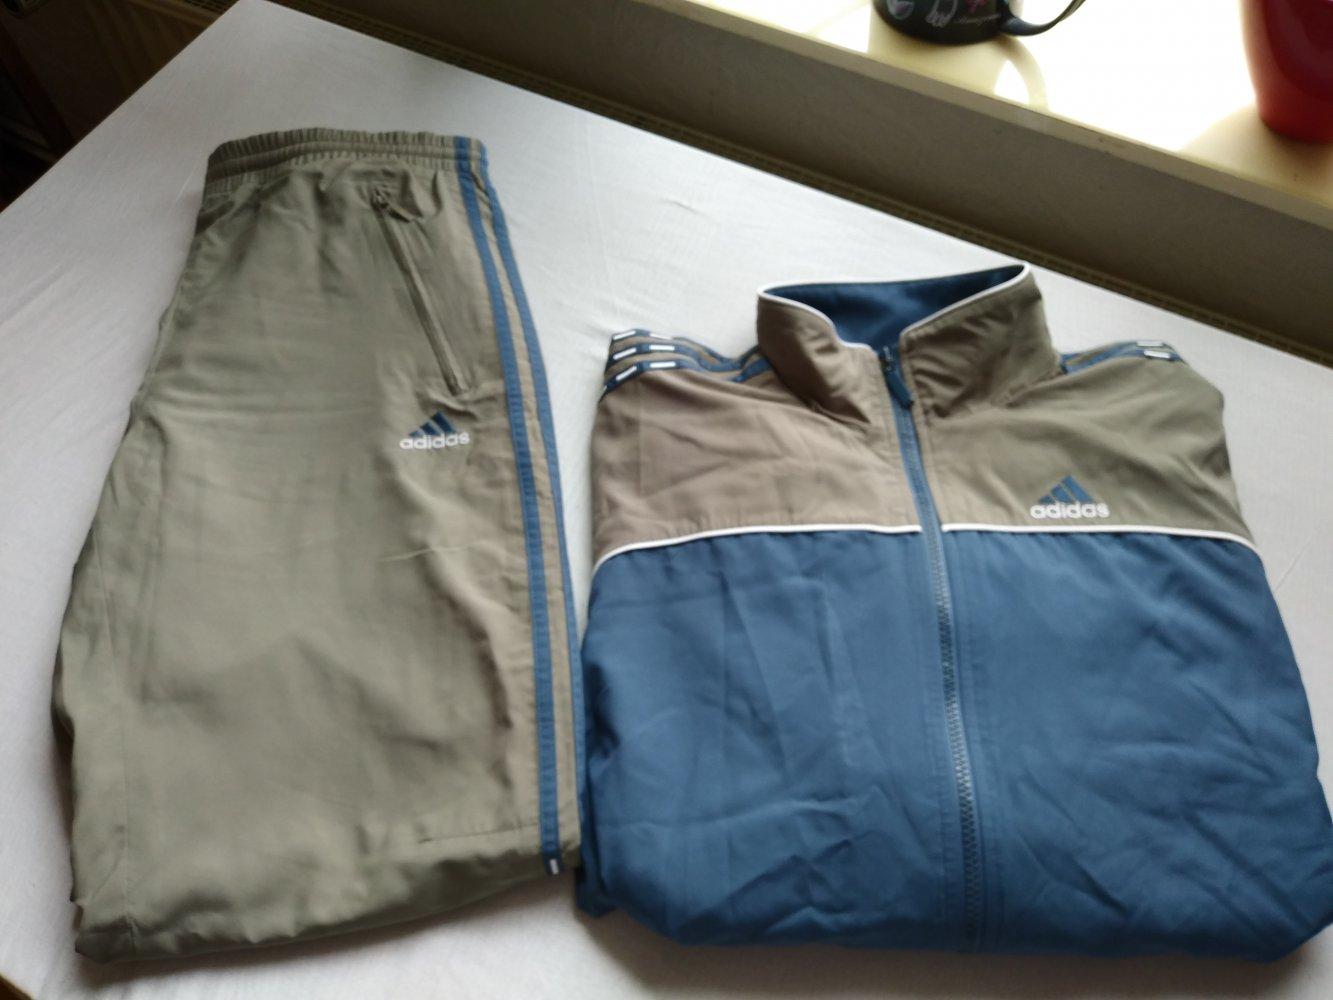 arriving lowest price wholesale Original Adidas Trainingsanzug Tracksuit Jacke Hose Retro wie Neu gr. M